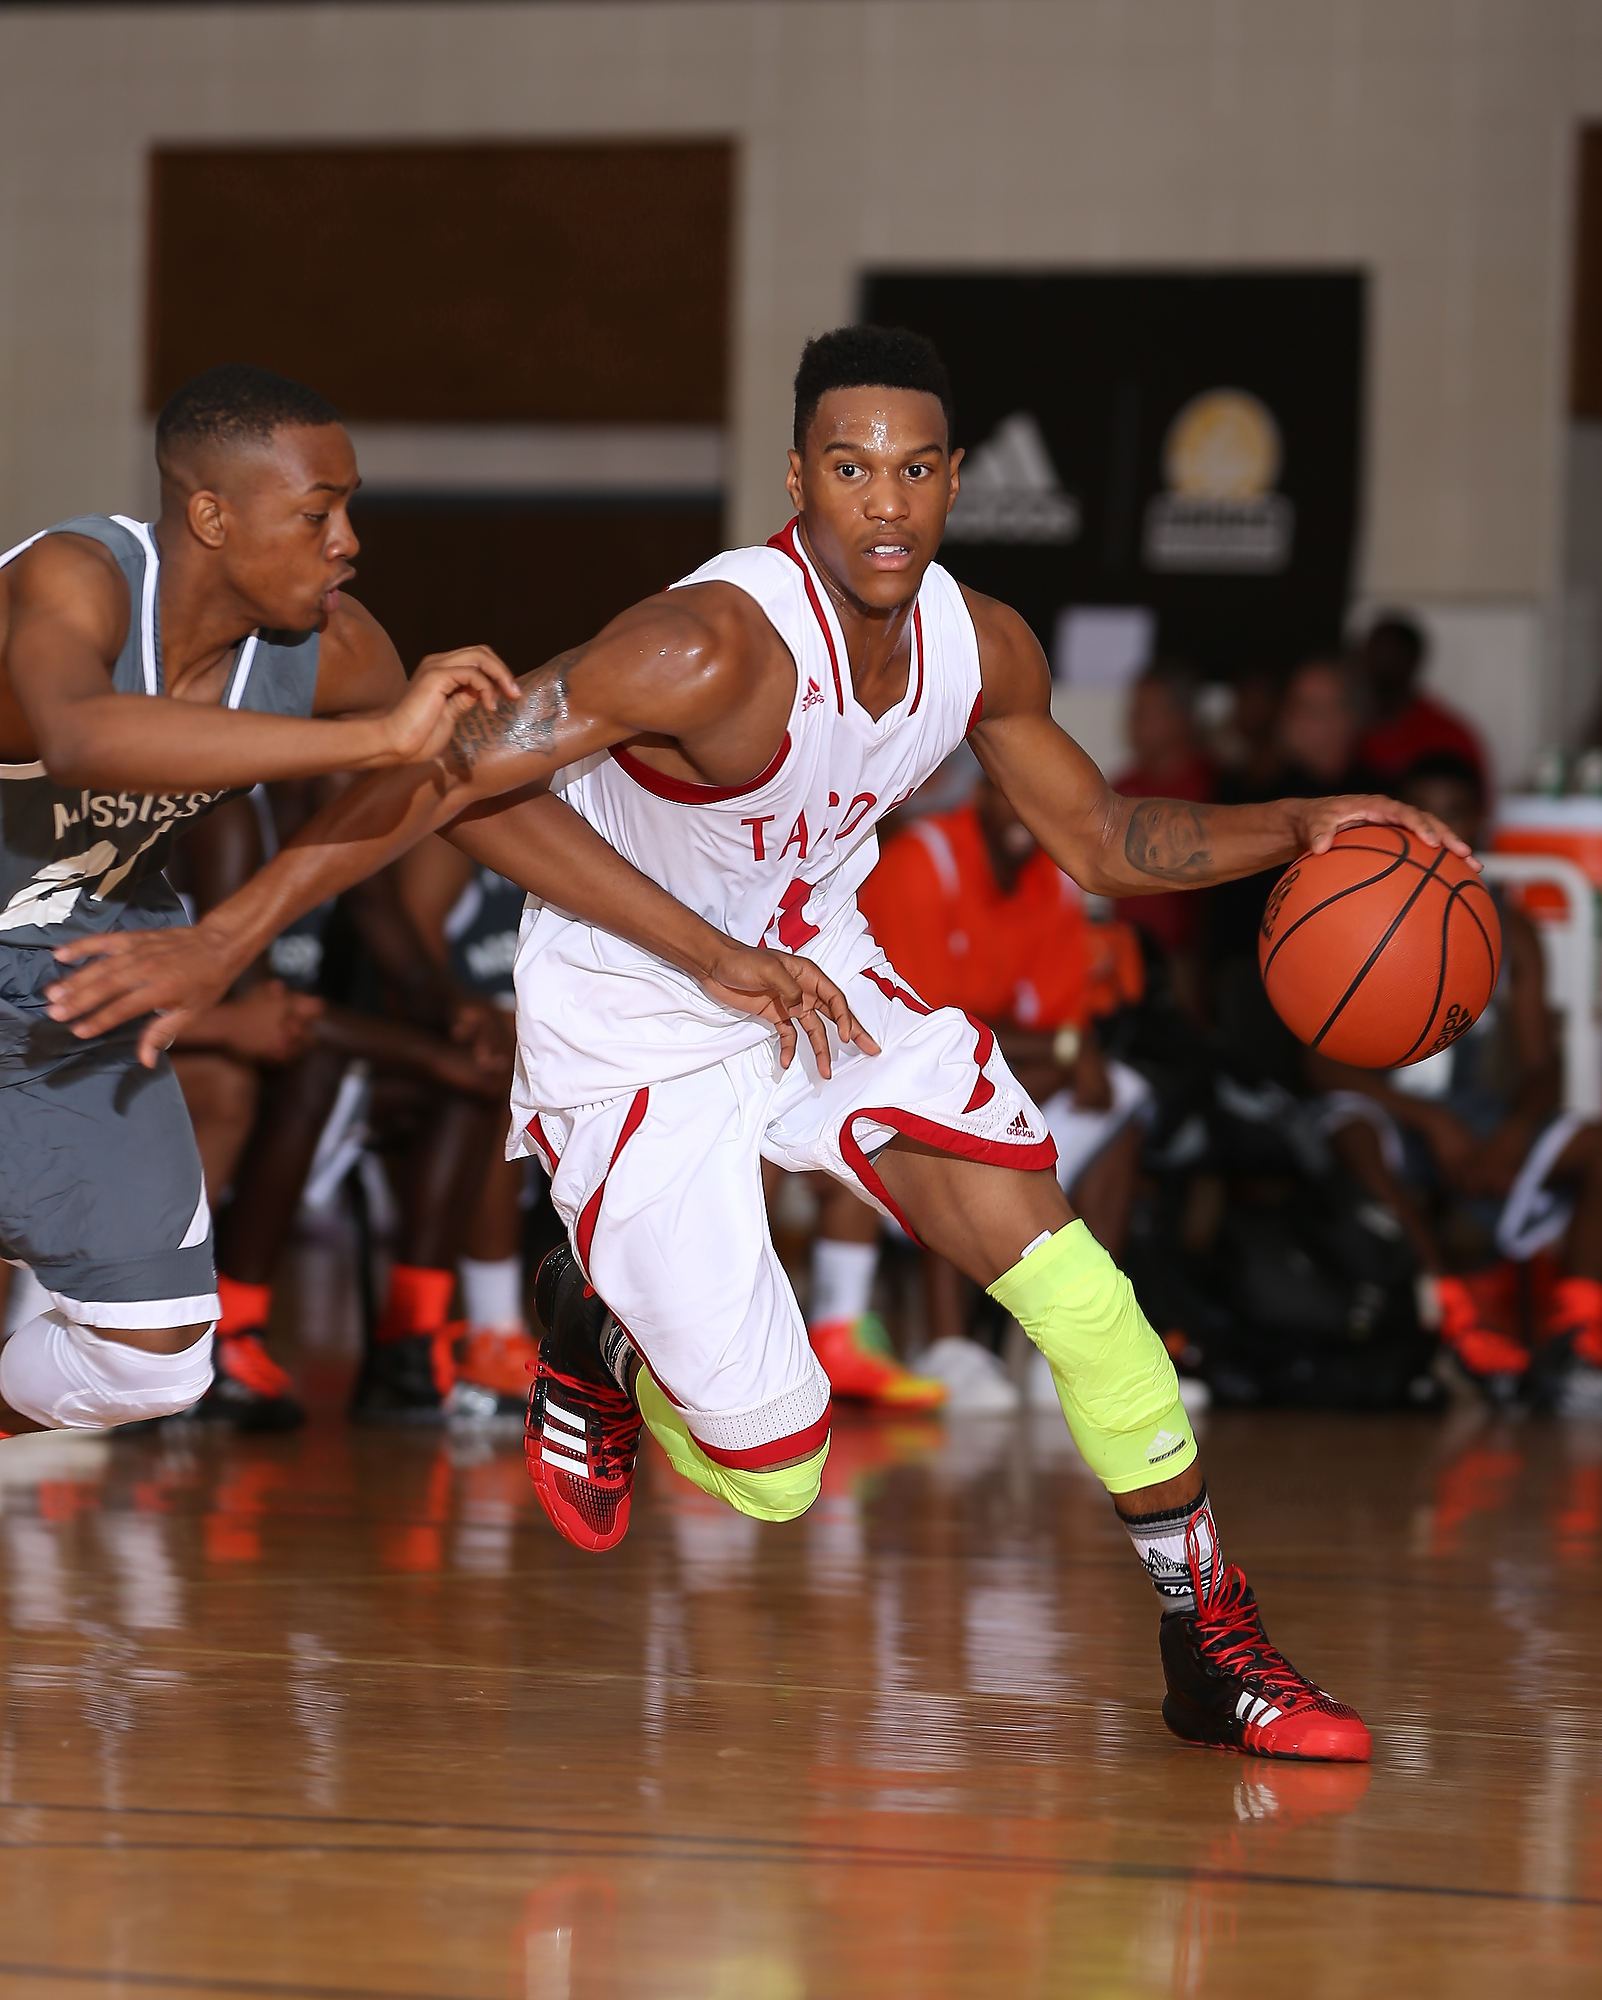 Big Weekend In High School Basketball: High School Basketball Vs. AAU